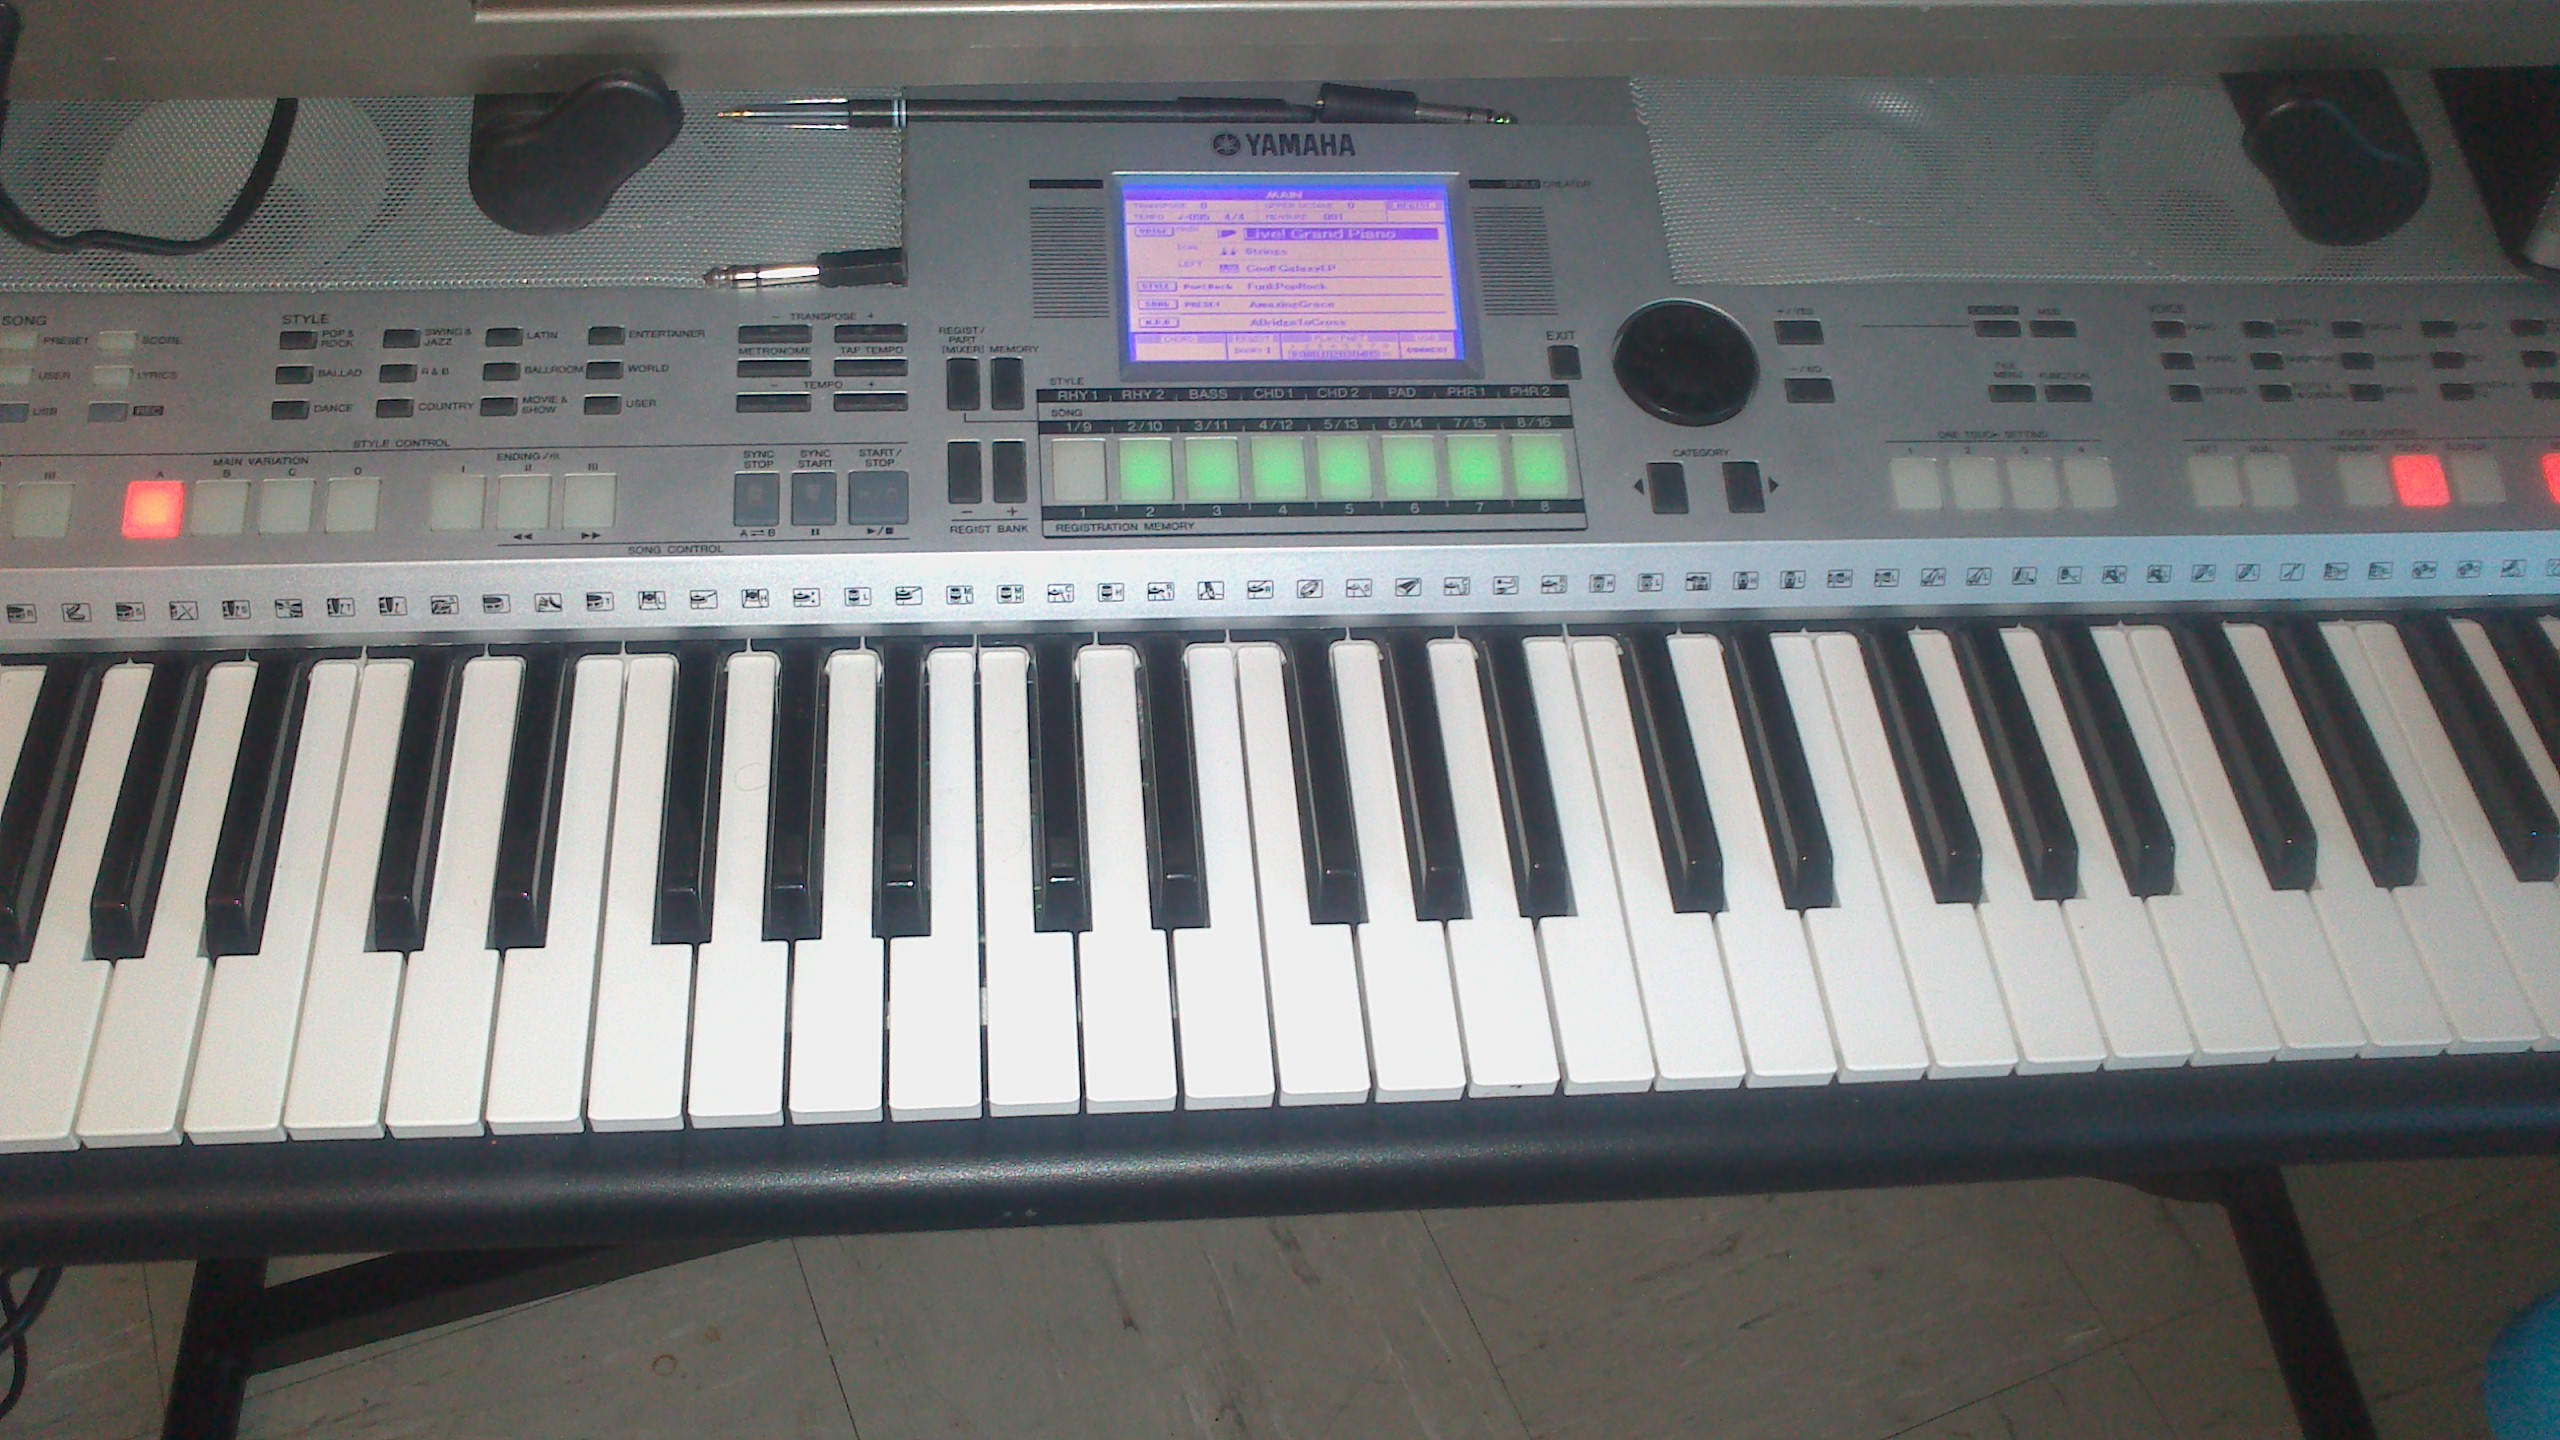 Yamaha psr s550 image 653874 audiofanzine for Yamaha psr s